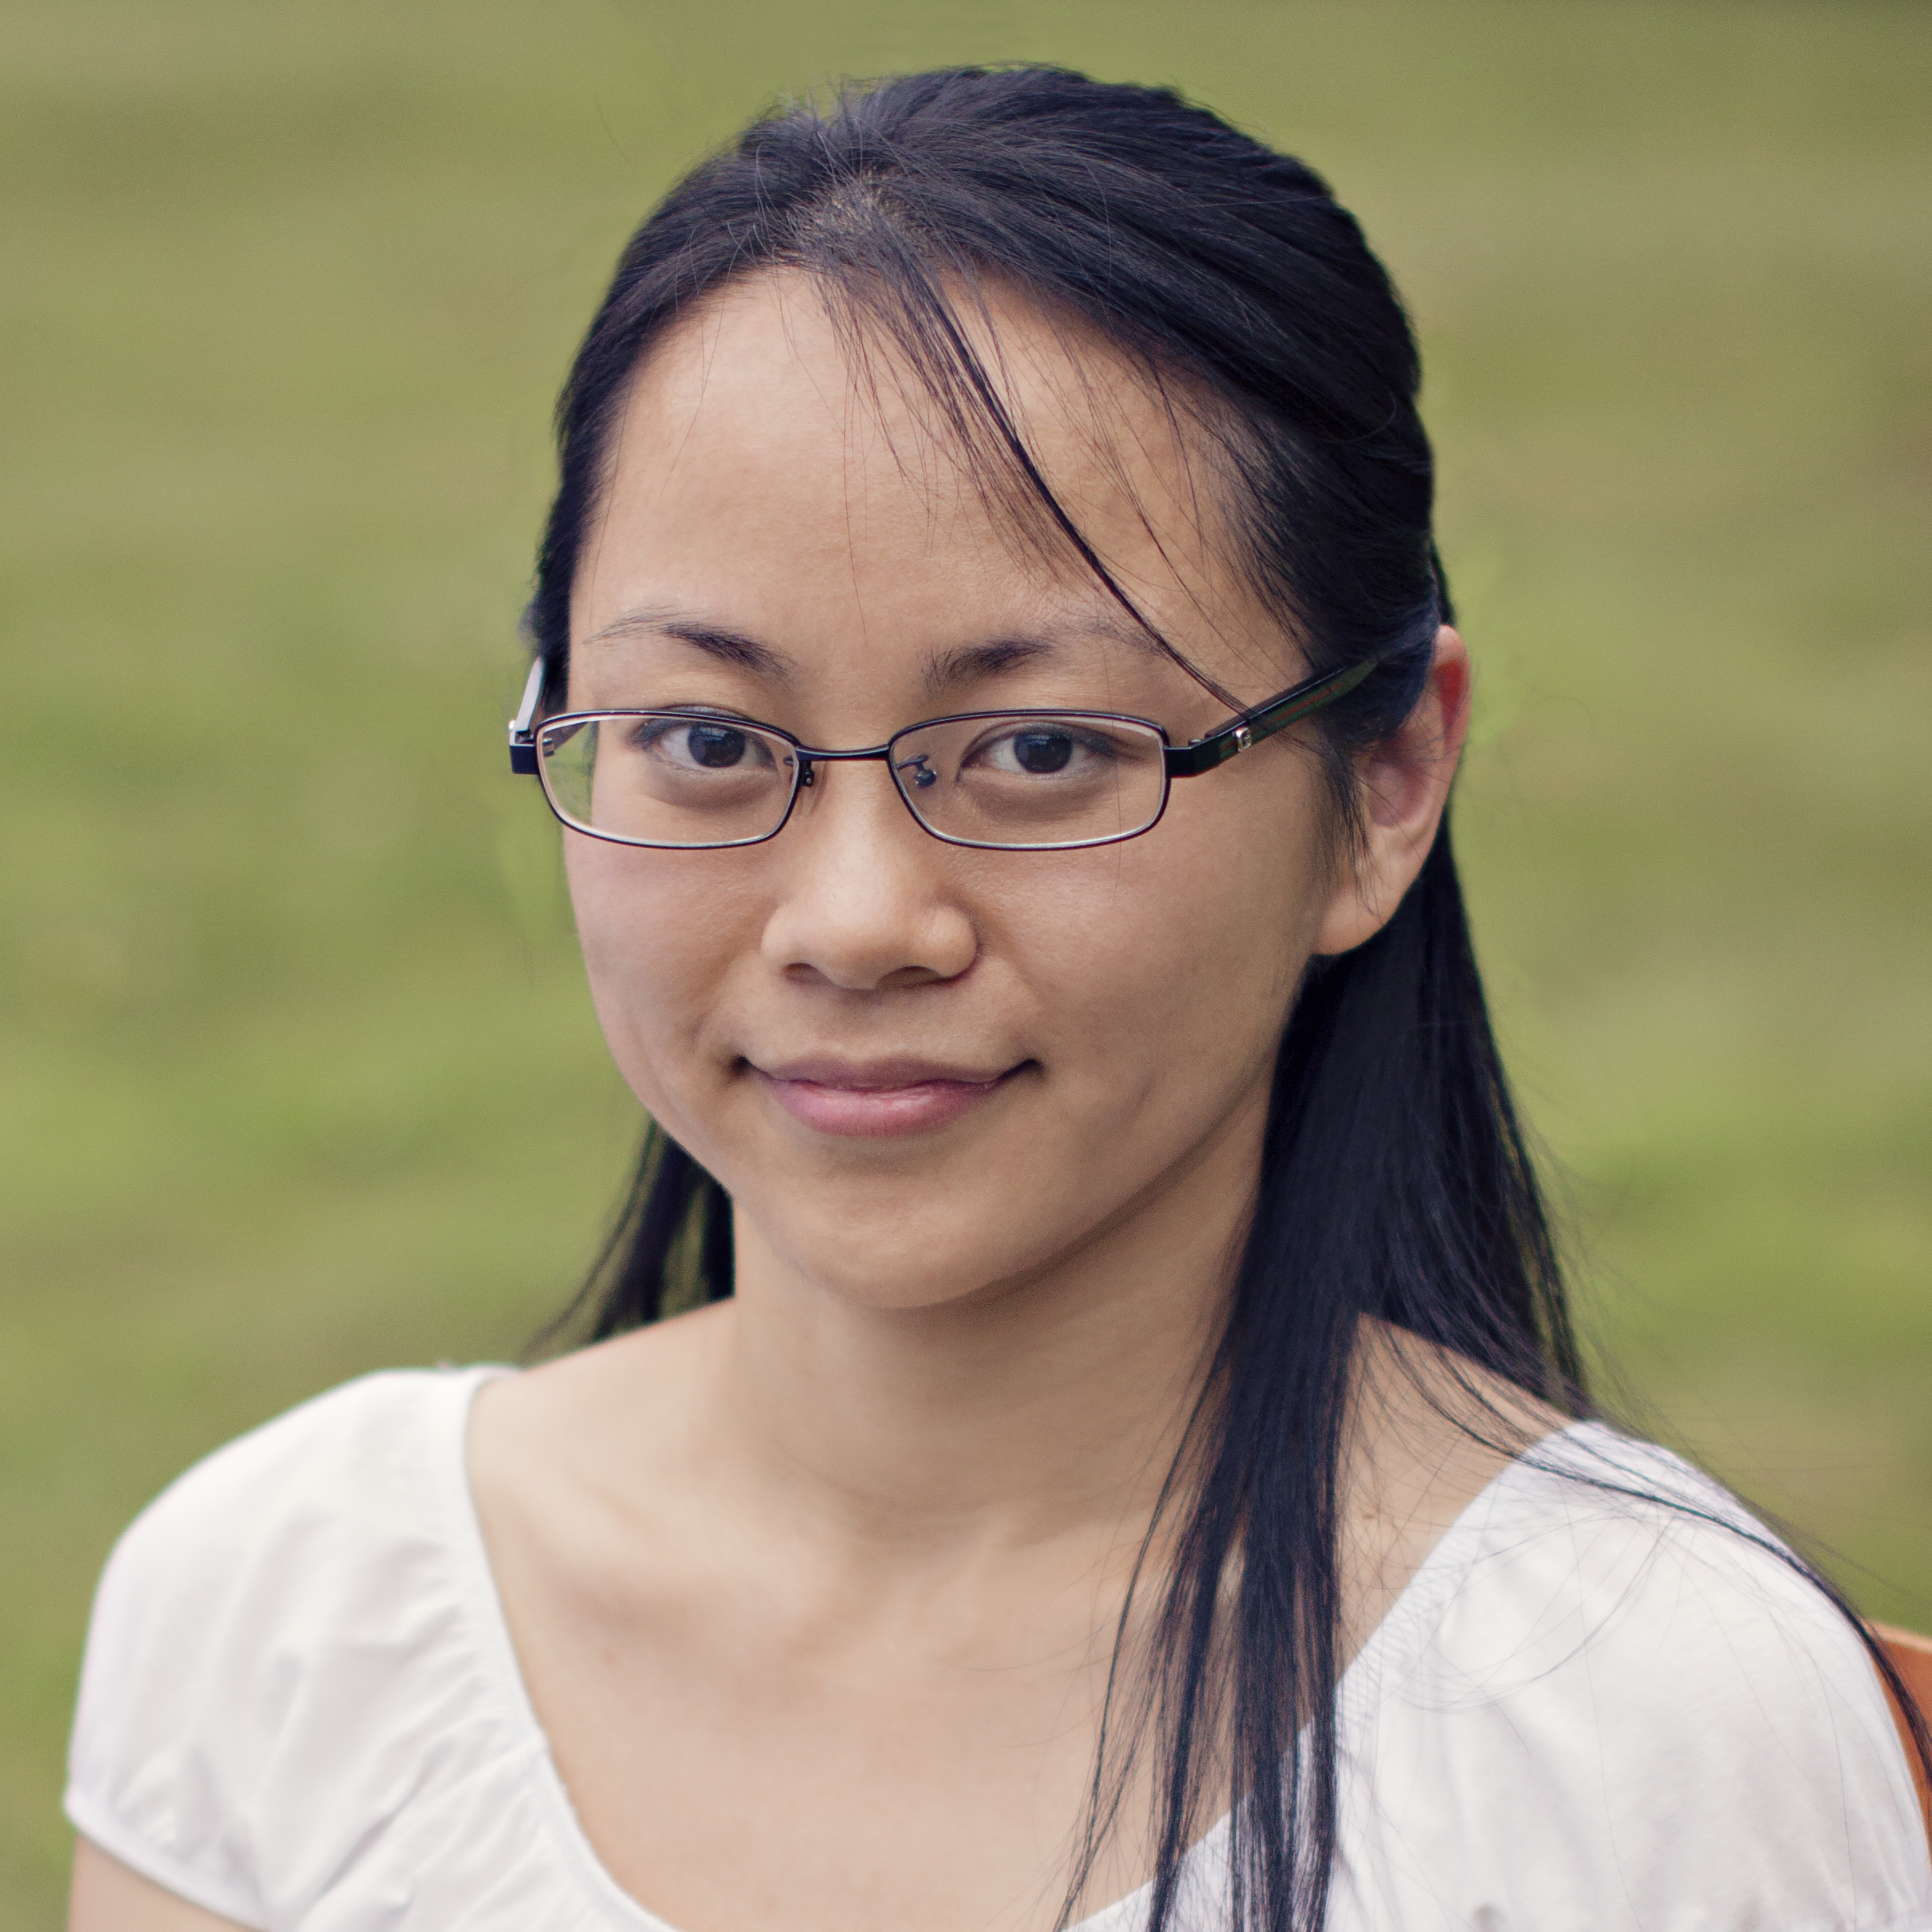 Lily Cho